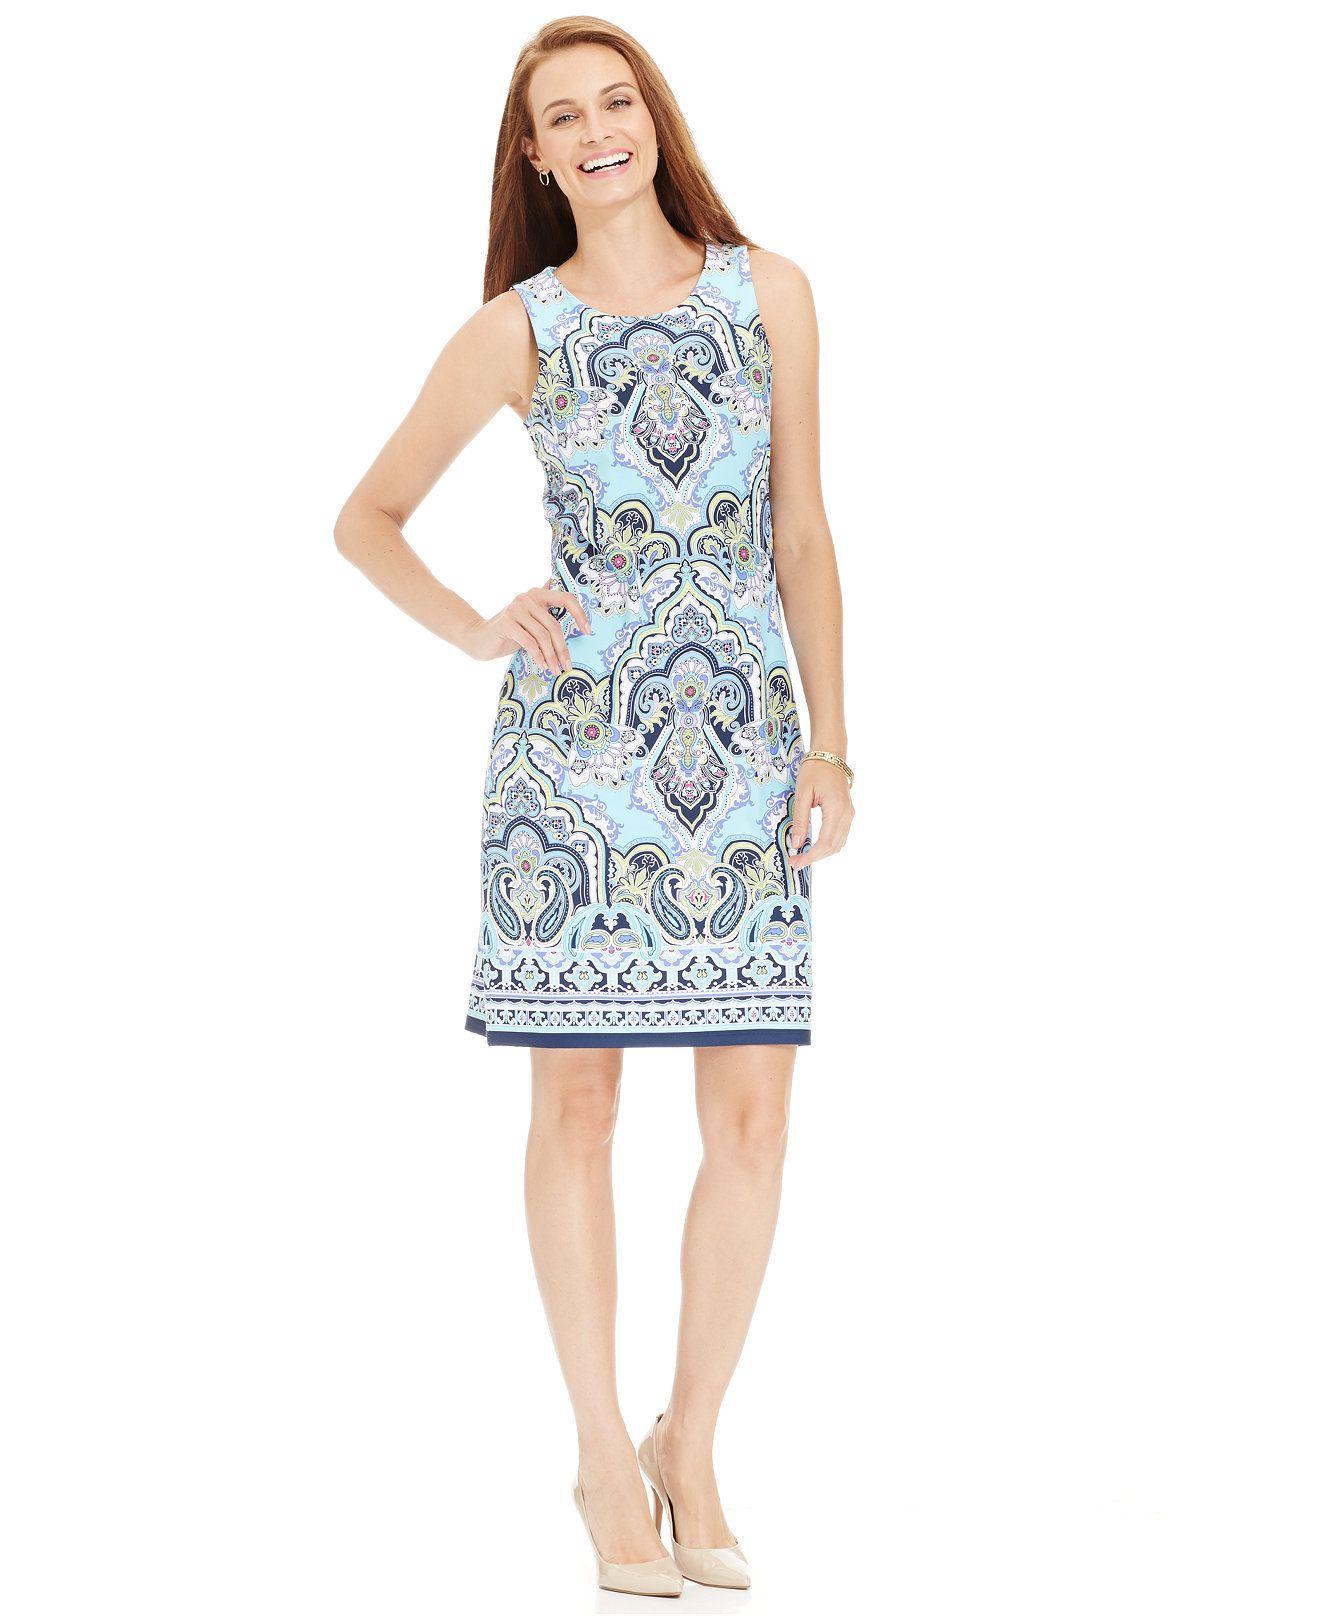 Charter club plus size sleeveless printed sheath dress dresses